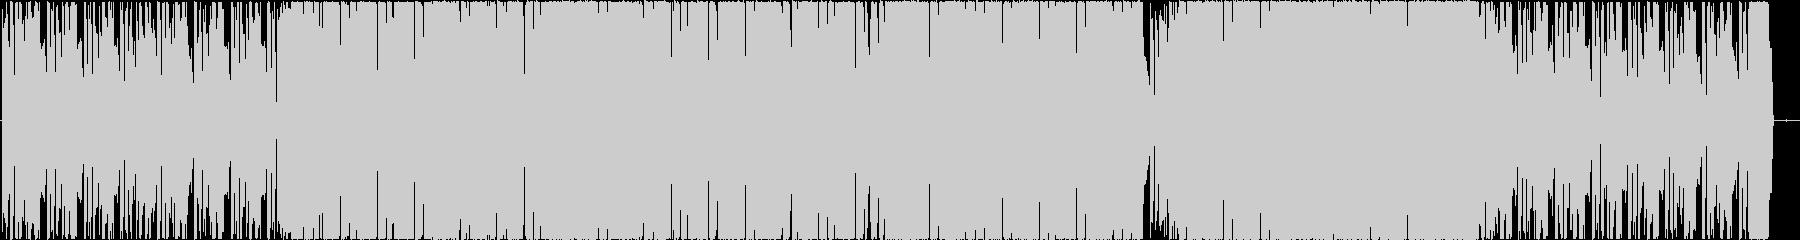 Swallowの未再生の波形